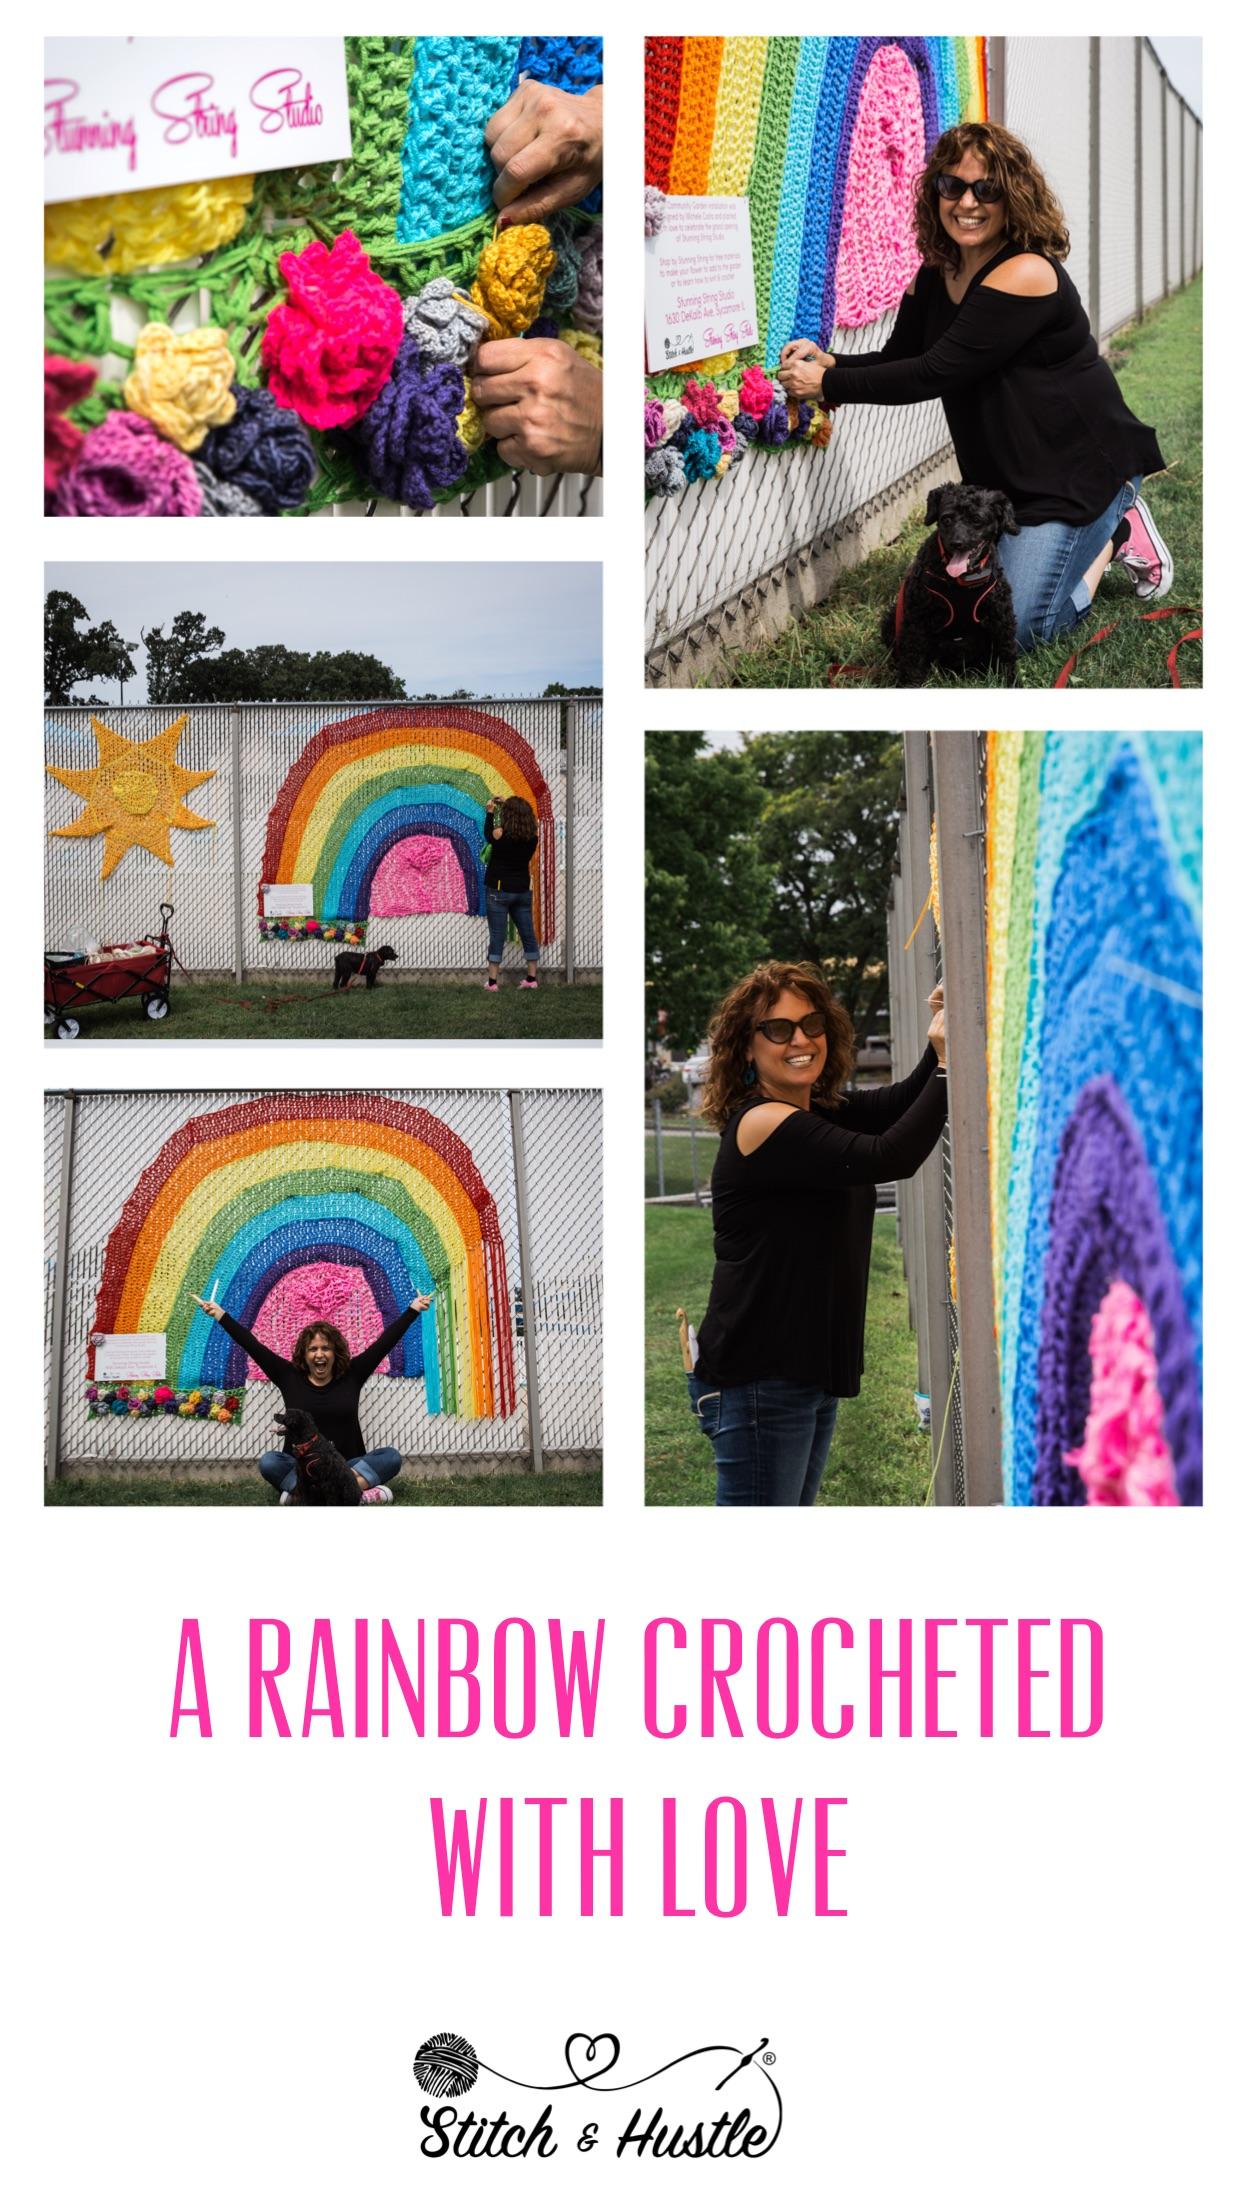 Stunning_string-rainbow-crochet-yarn-bomb-7.jpg